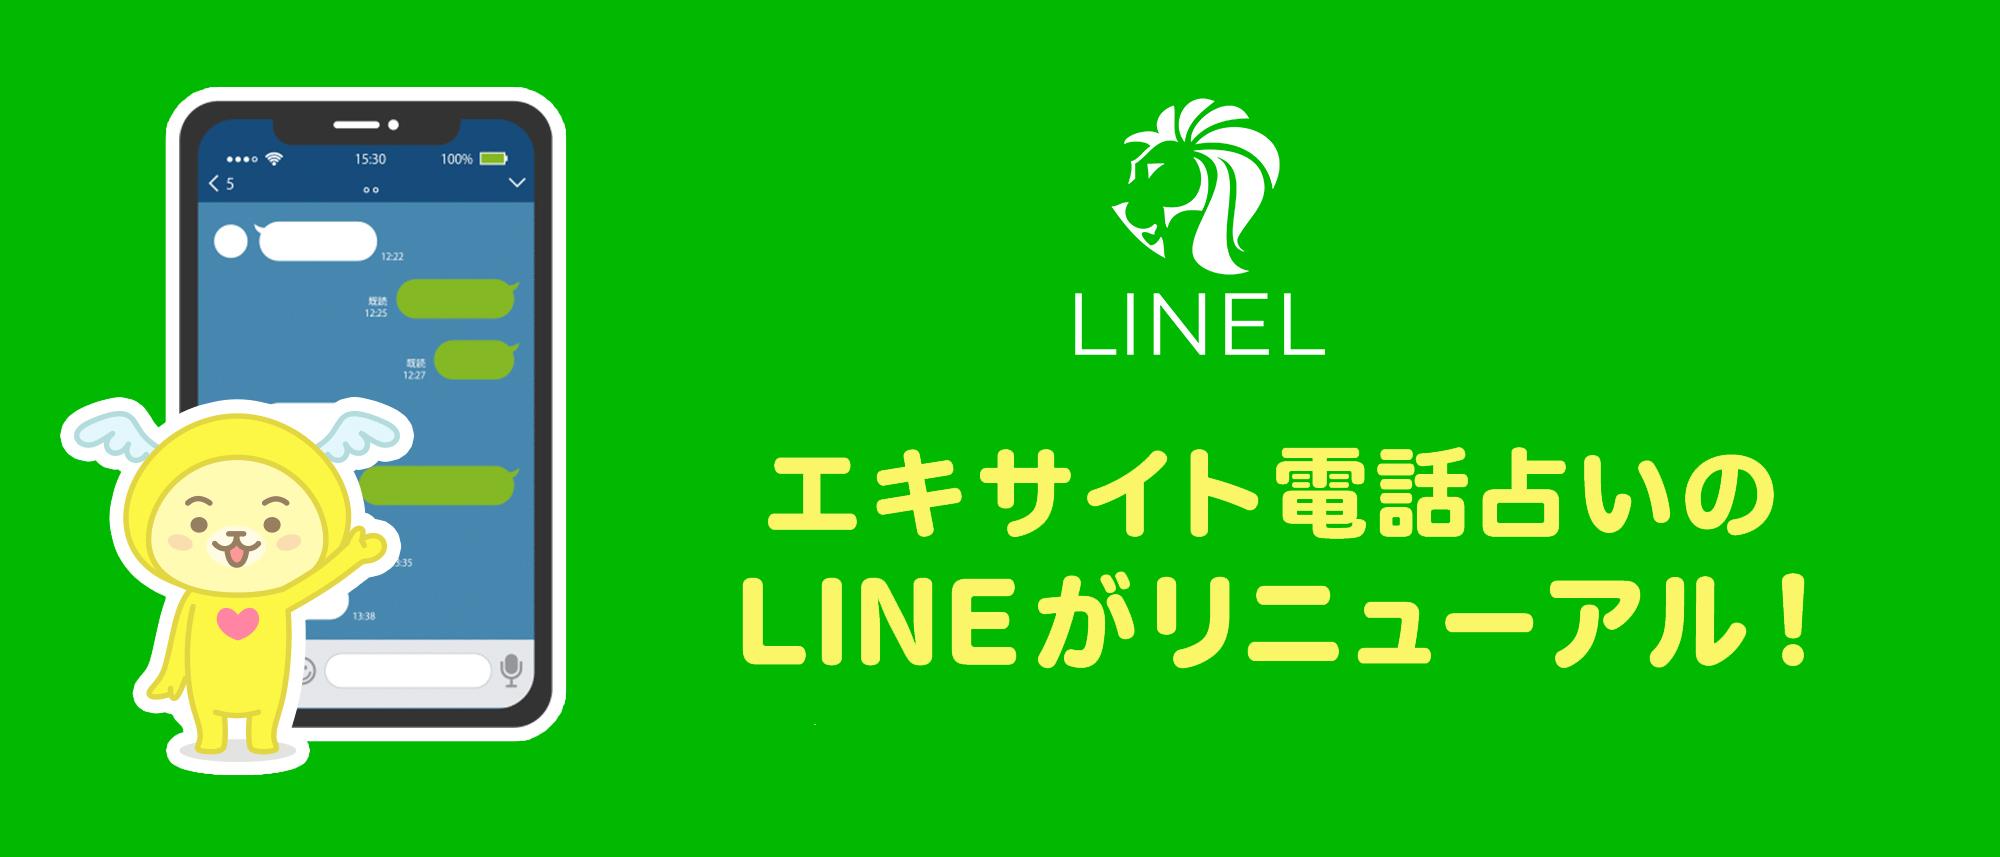 LINE統合ツール[LINEL]